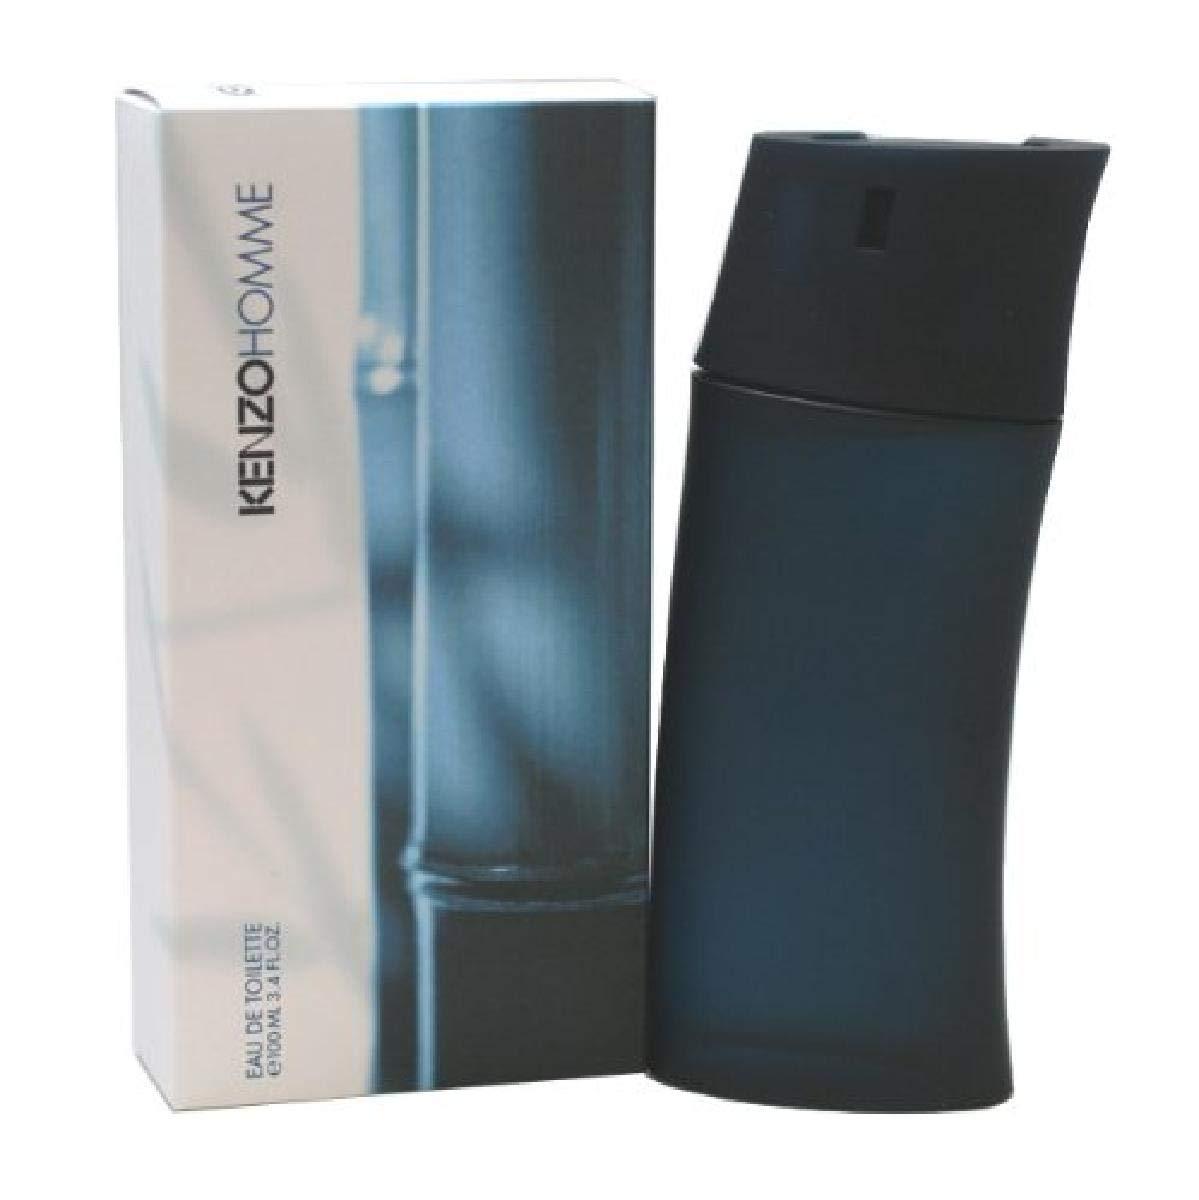 kenzo perfume for men price